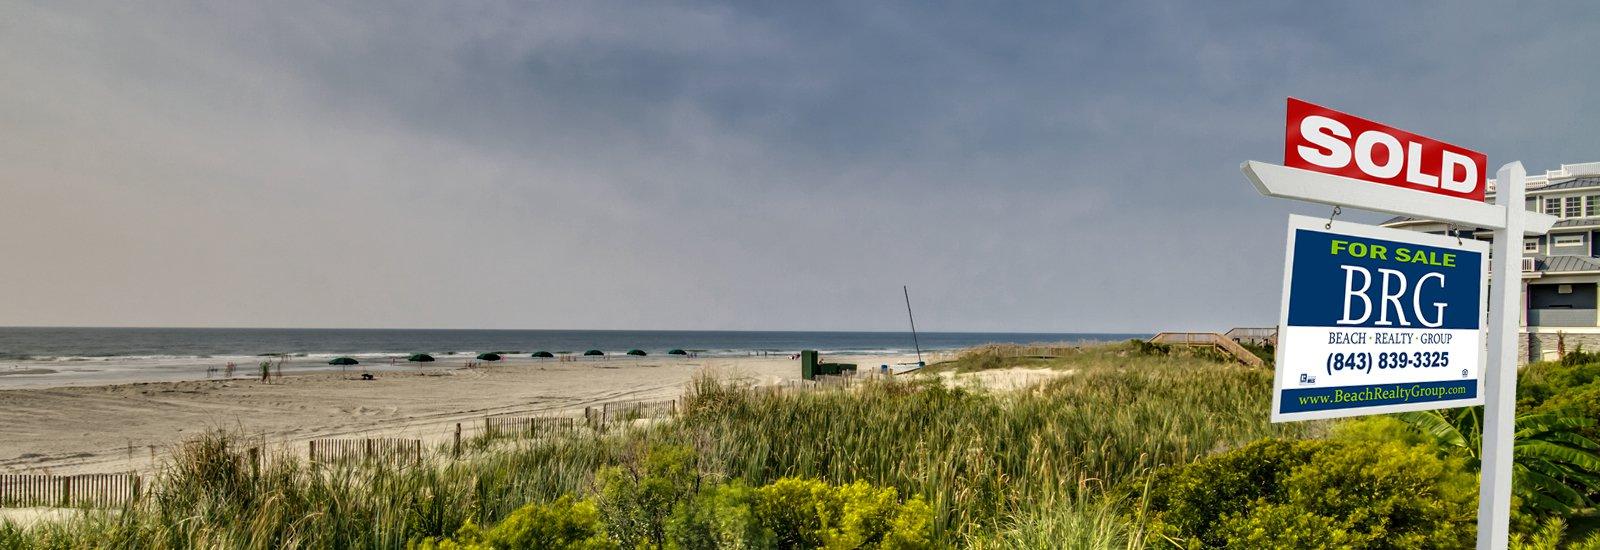 Beach Realty Group | Myrtle Beach REALTORs